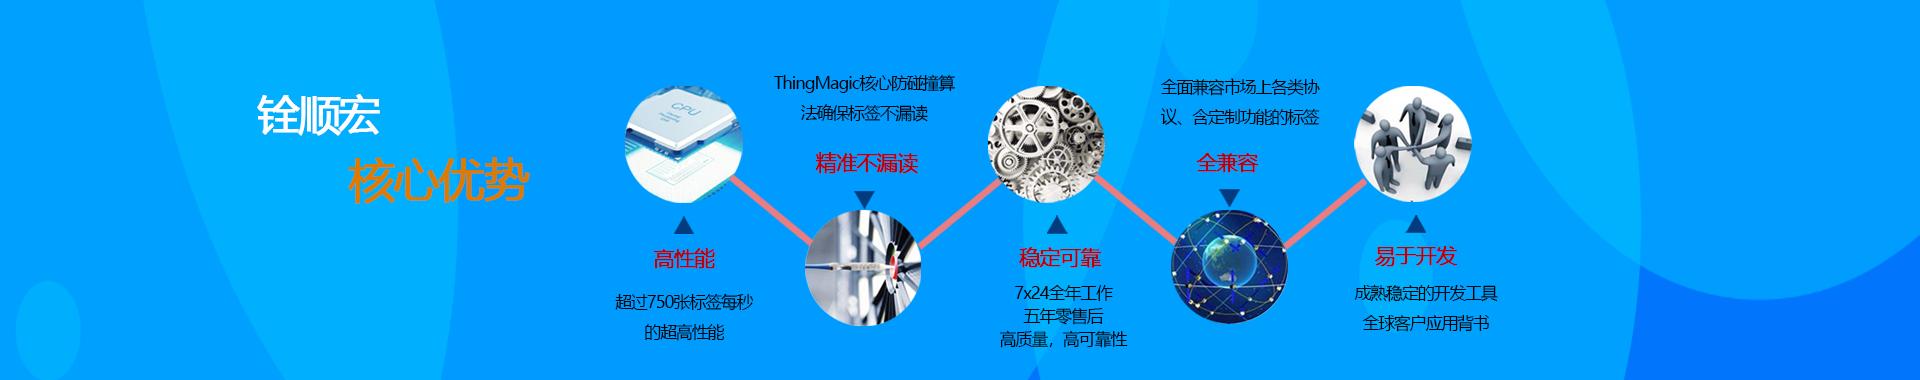 RFID射频识别技术,RFID性能,RFID距离,铨顺宏科技